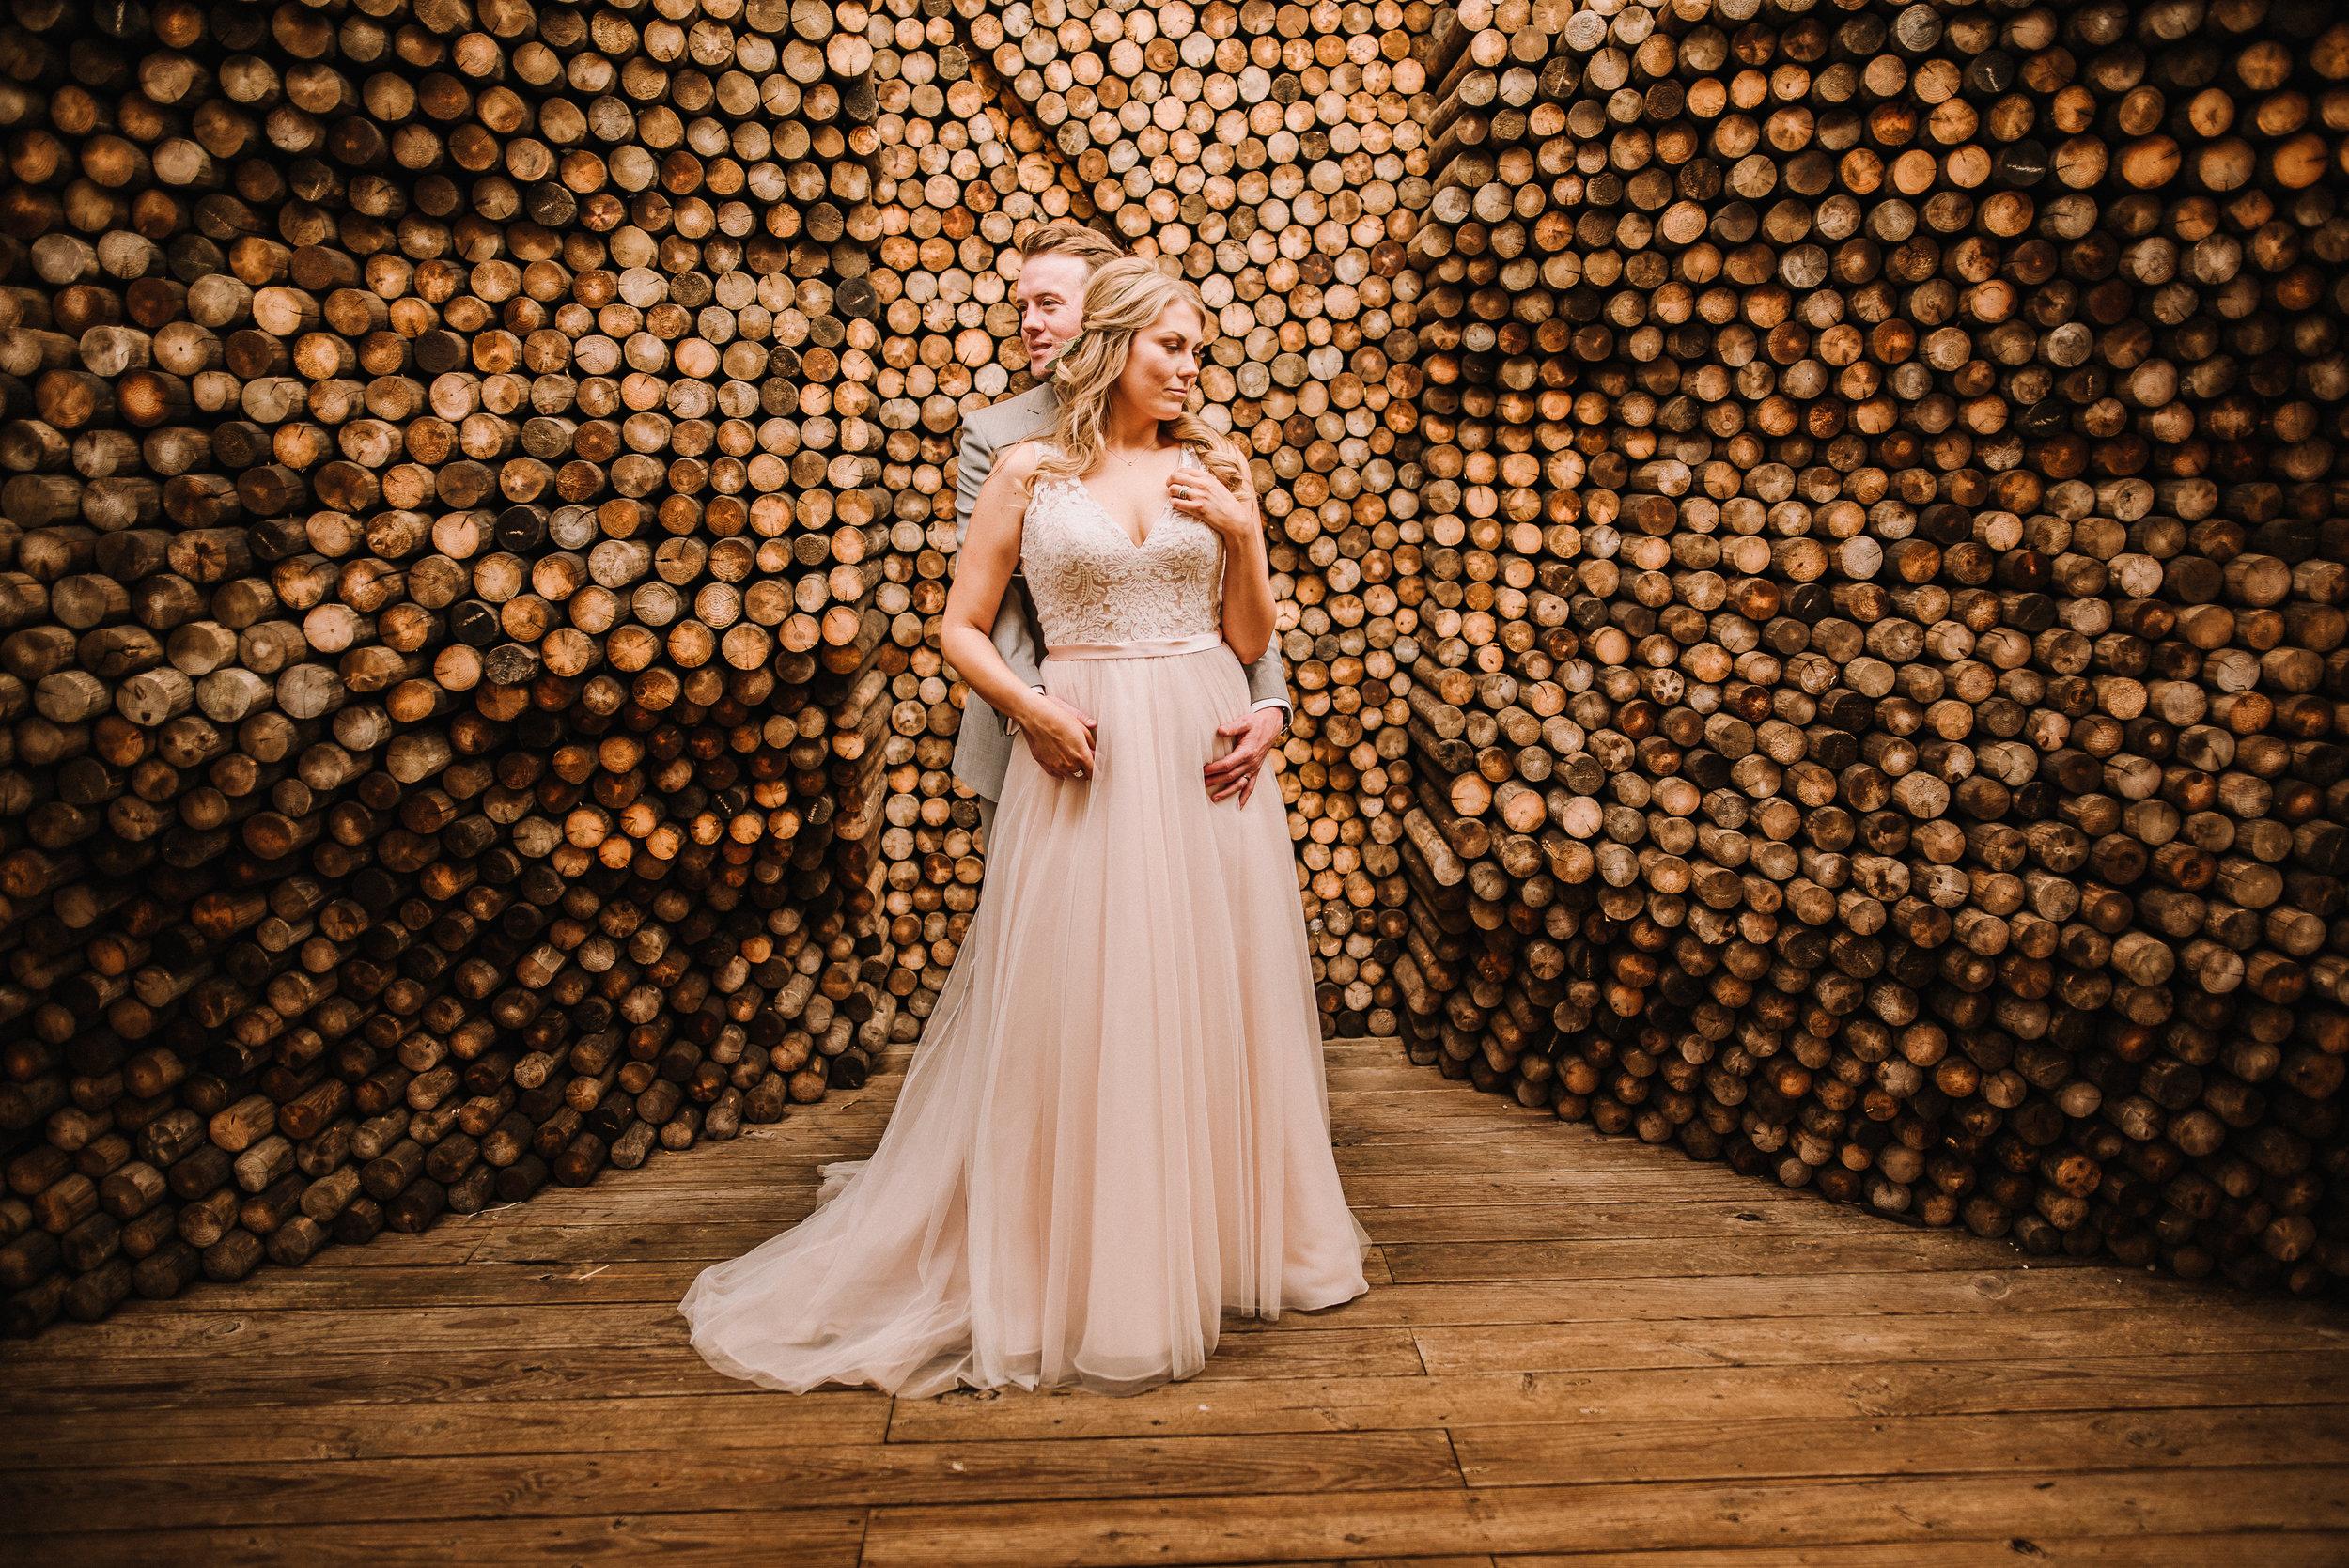 Pearson-Wiseacre-Wedding_Ashley-Benham-Photography (294 of 633).jpg